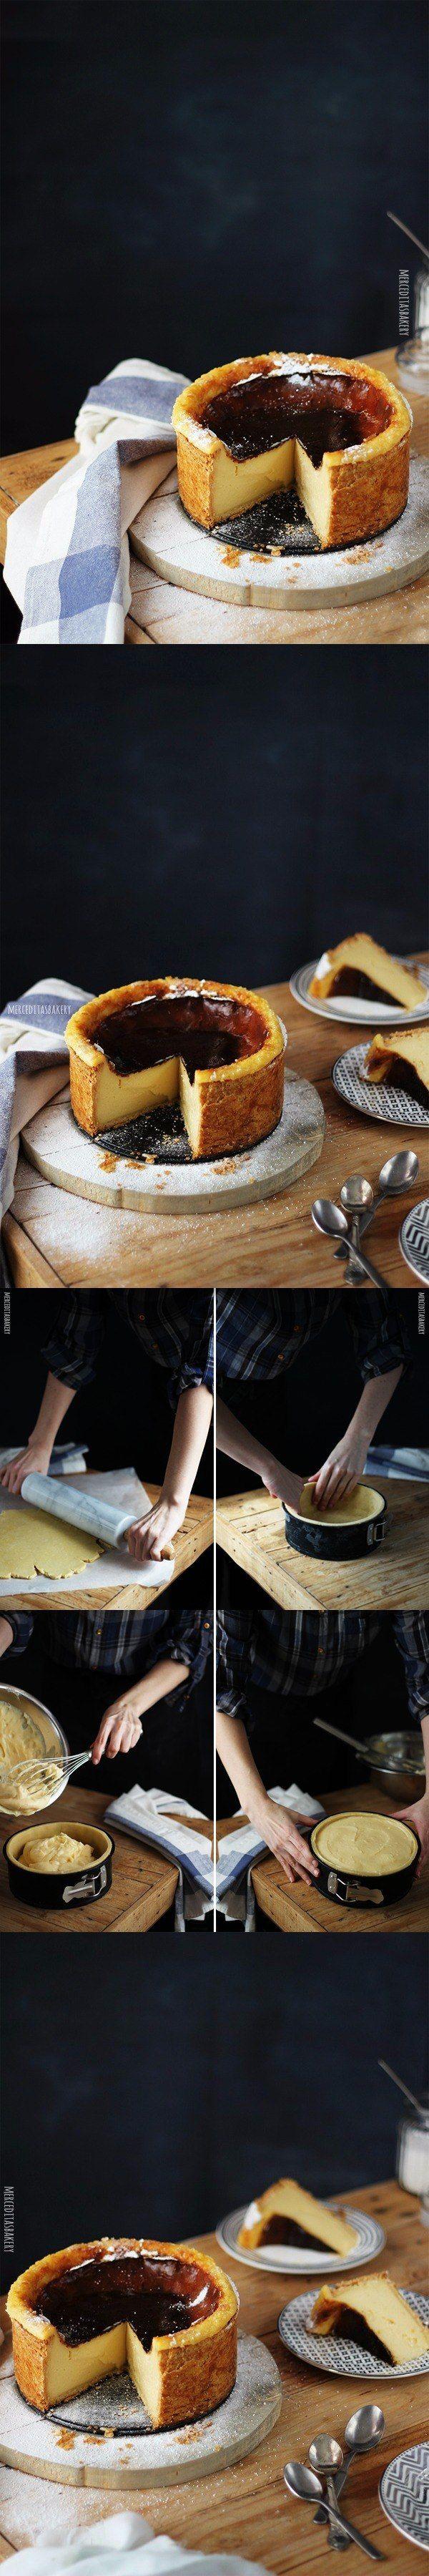 Exquisito flan parisino flan cake and postres bakeries forumfinder Choice Image